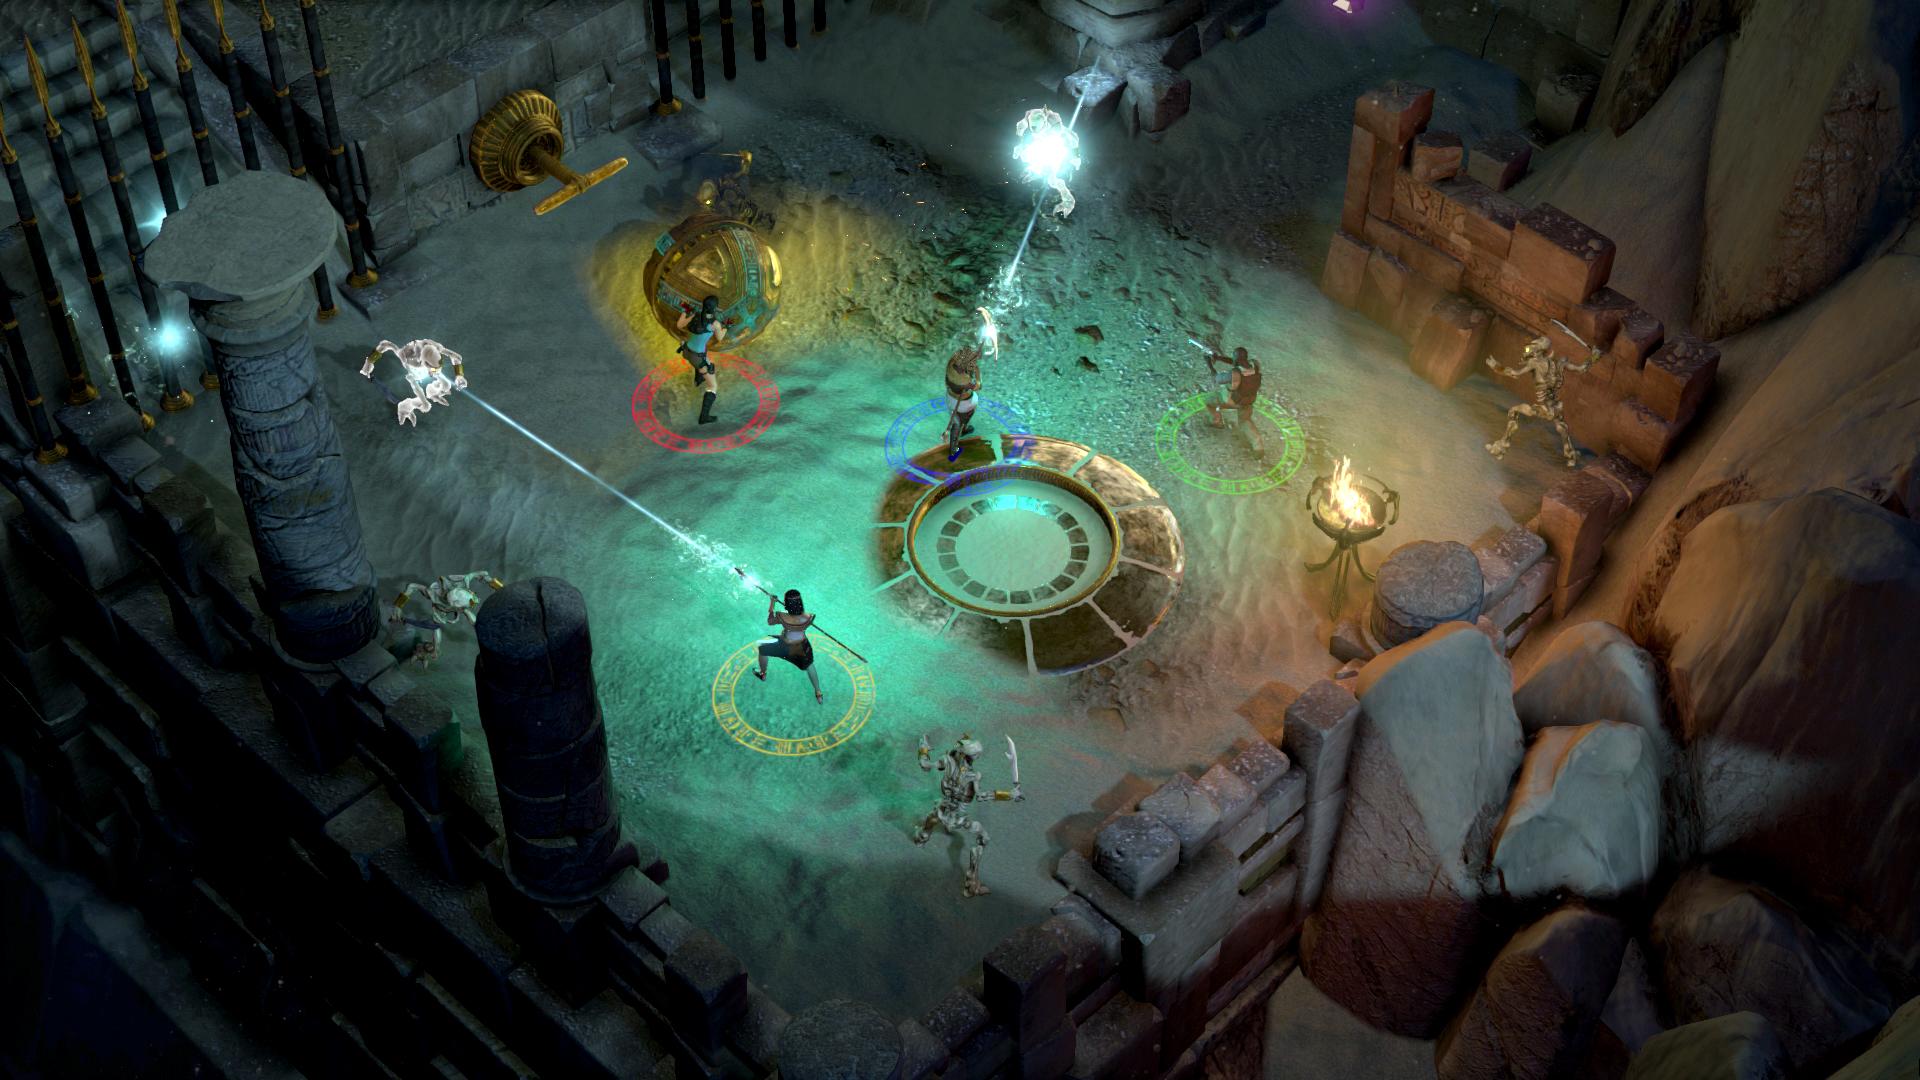 Lara Croft and the Temple of Osiris screenshot